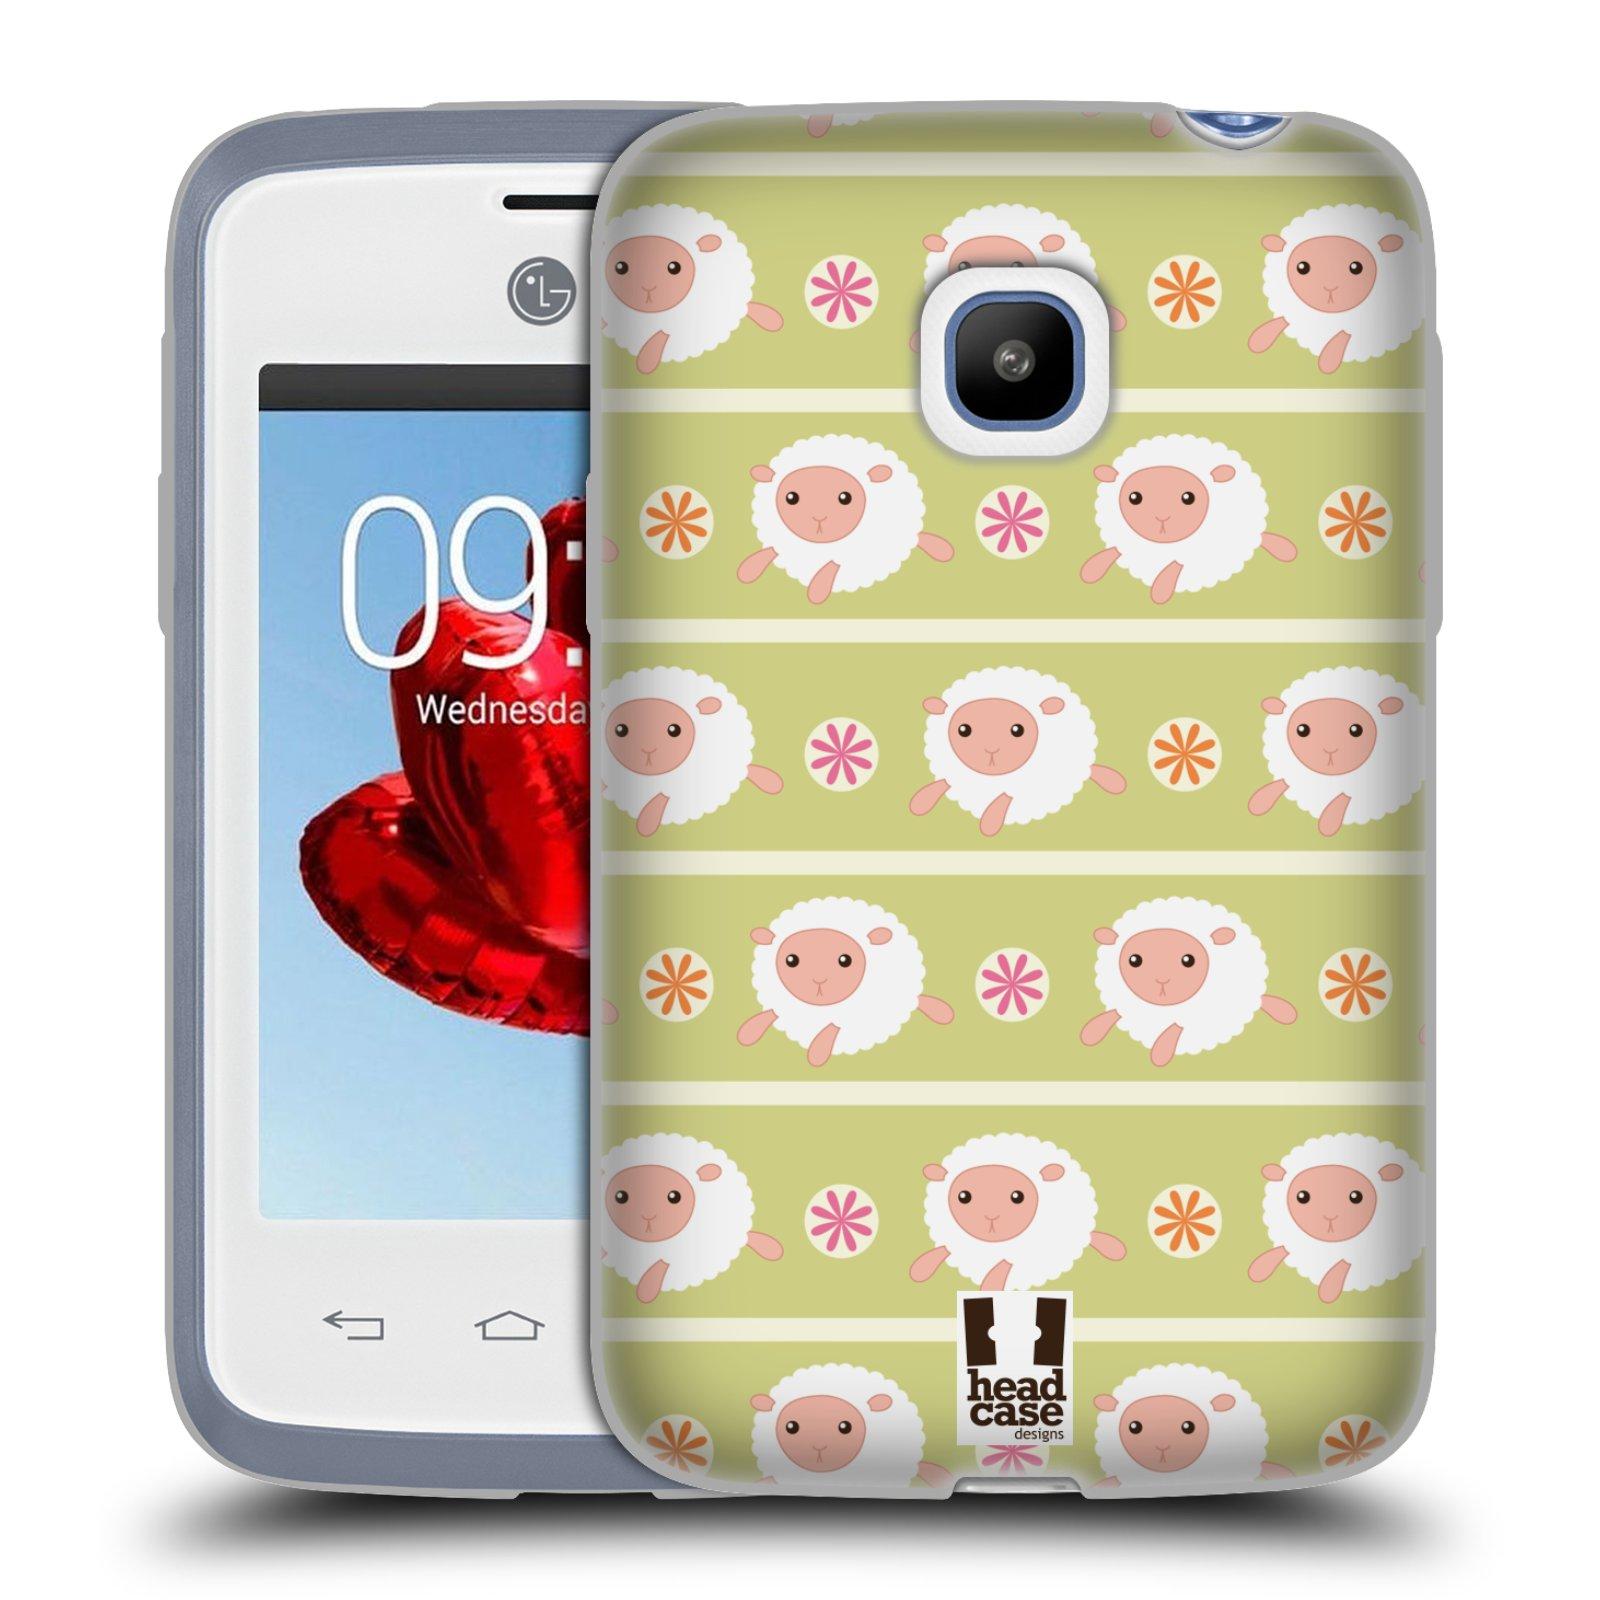 HEAD CASE silikonový obal na mobil LG L20 vzor roztomilé zvířecí vzory ovečky